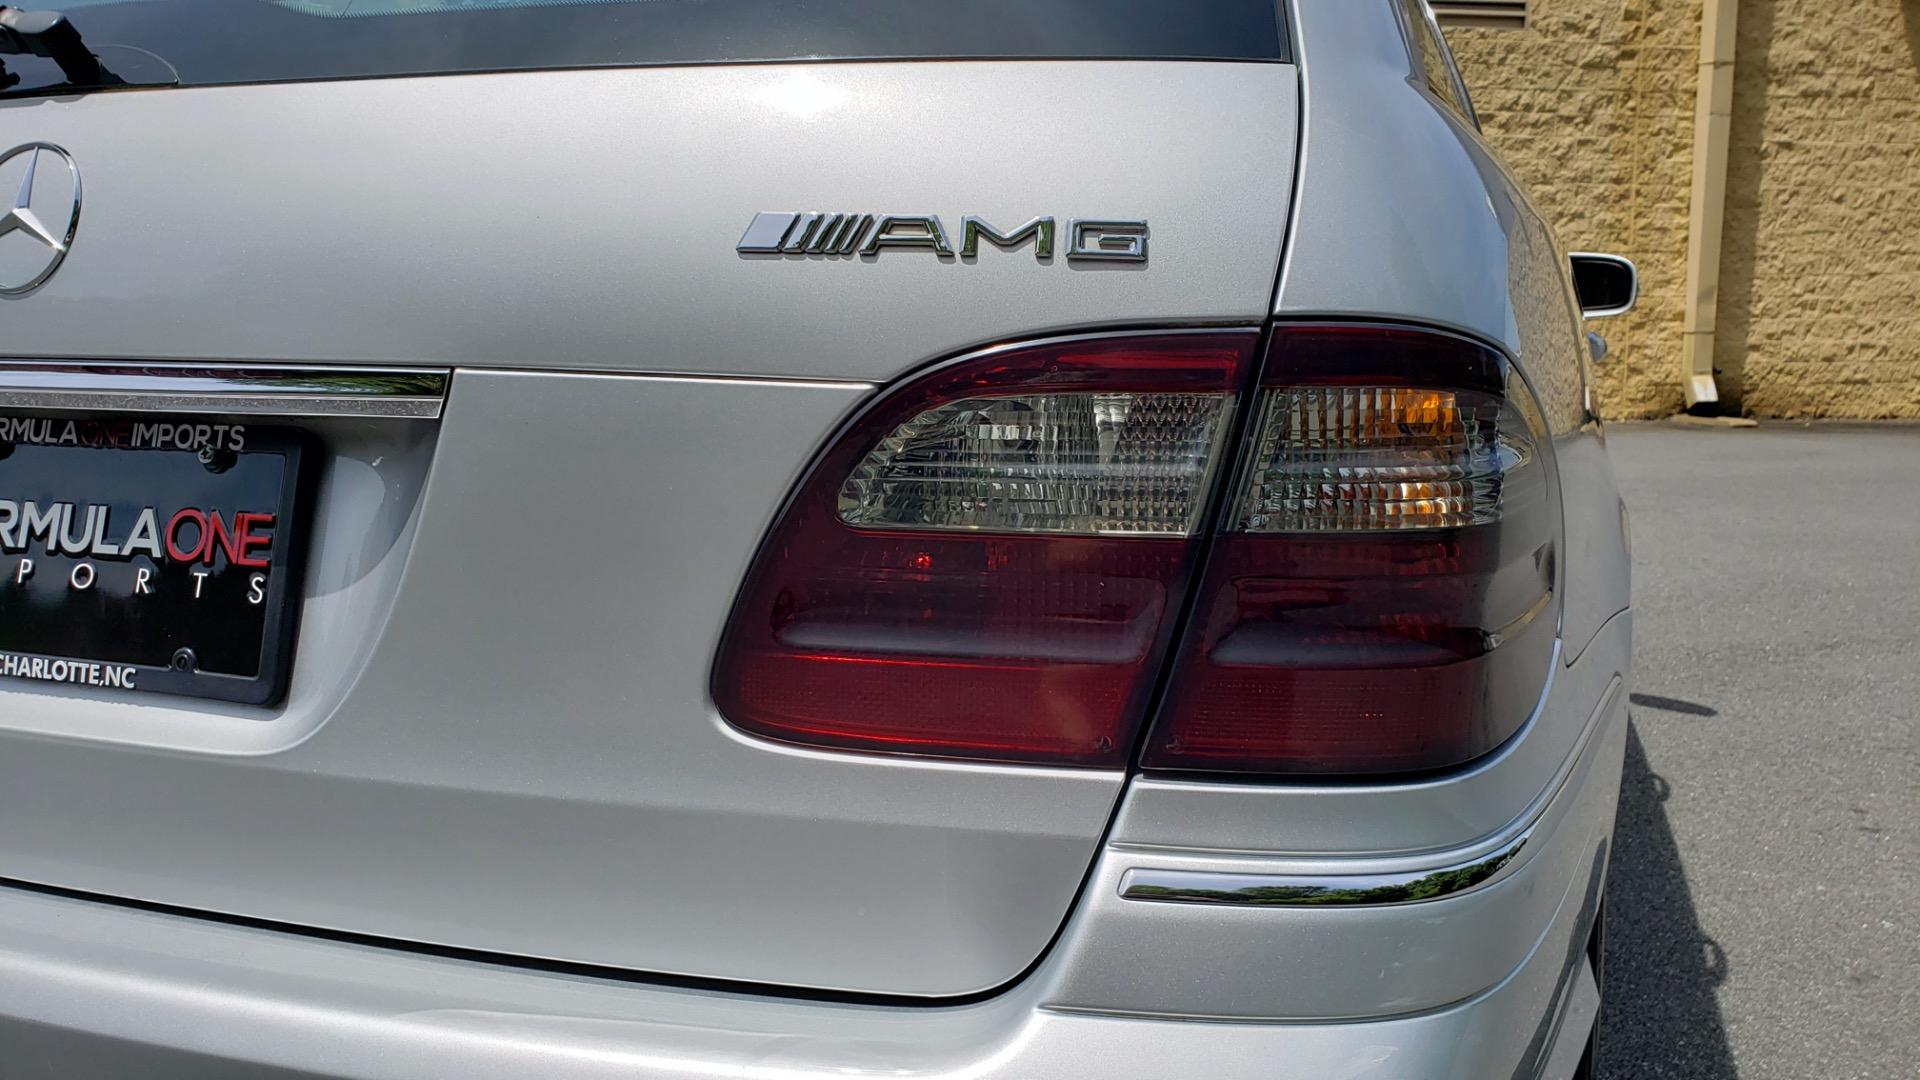 Used 2007 Mercedes-Benz E-Class E63 AMG WAGON / NAV / SUNROOF / HARMAN/KARDON for sale $29,000 at Formula Imports in Charlotte NC 28227 28